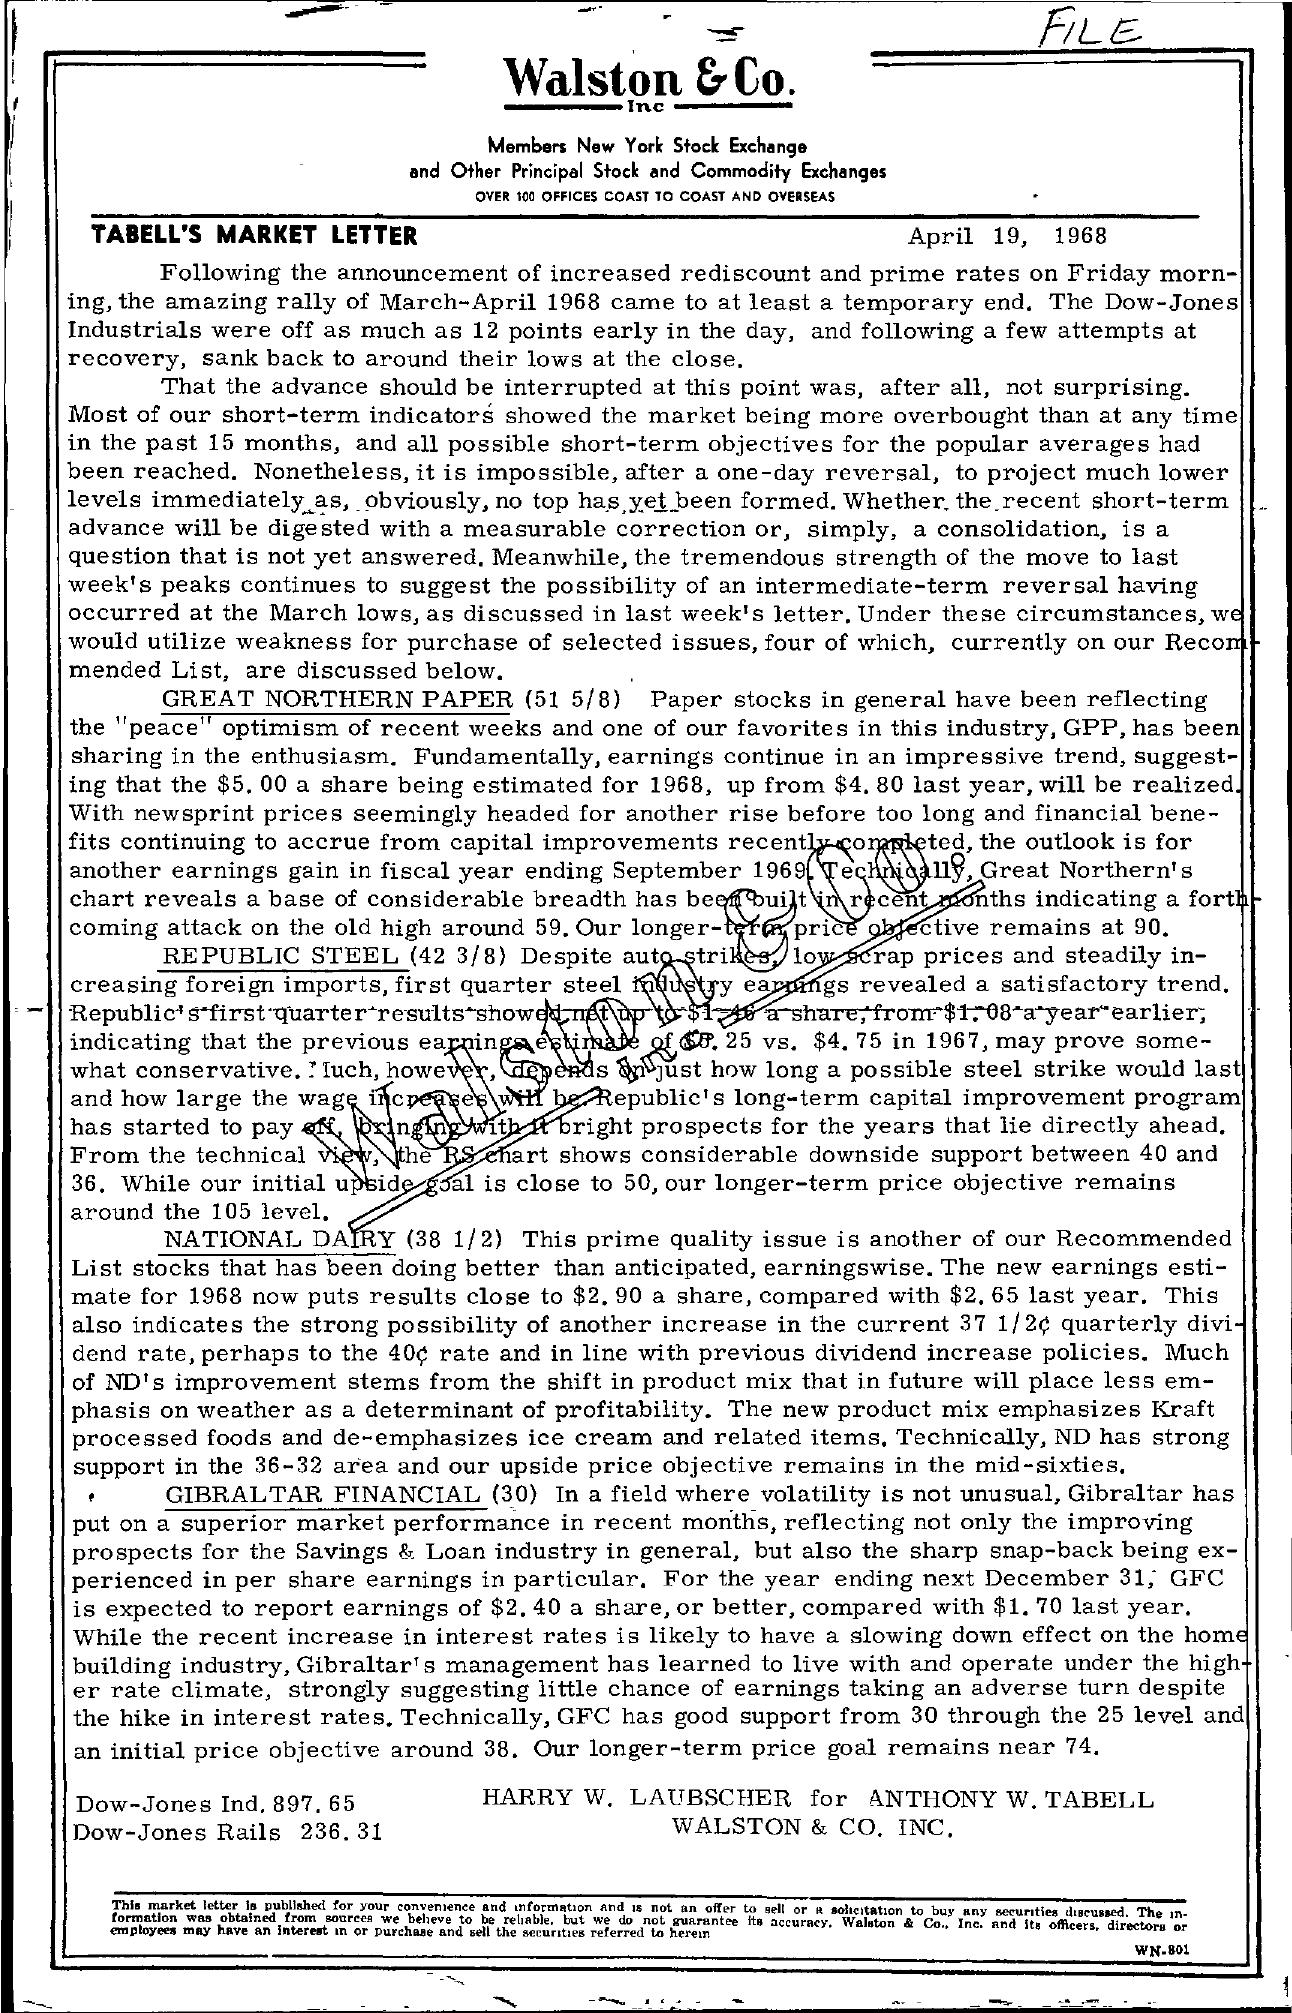 Tabell's Market Letter - April 19, 1968